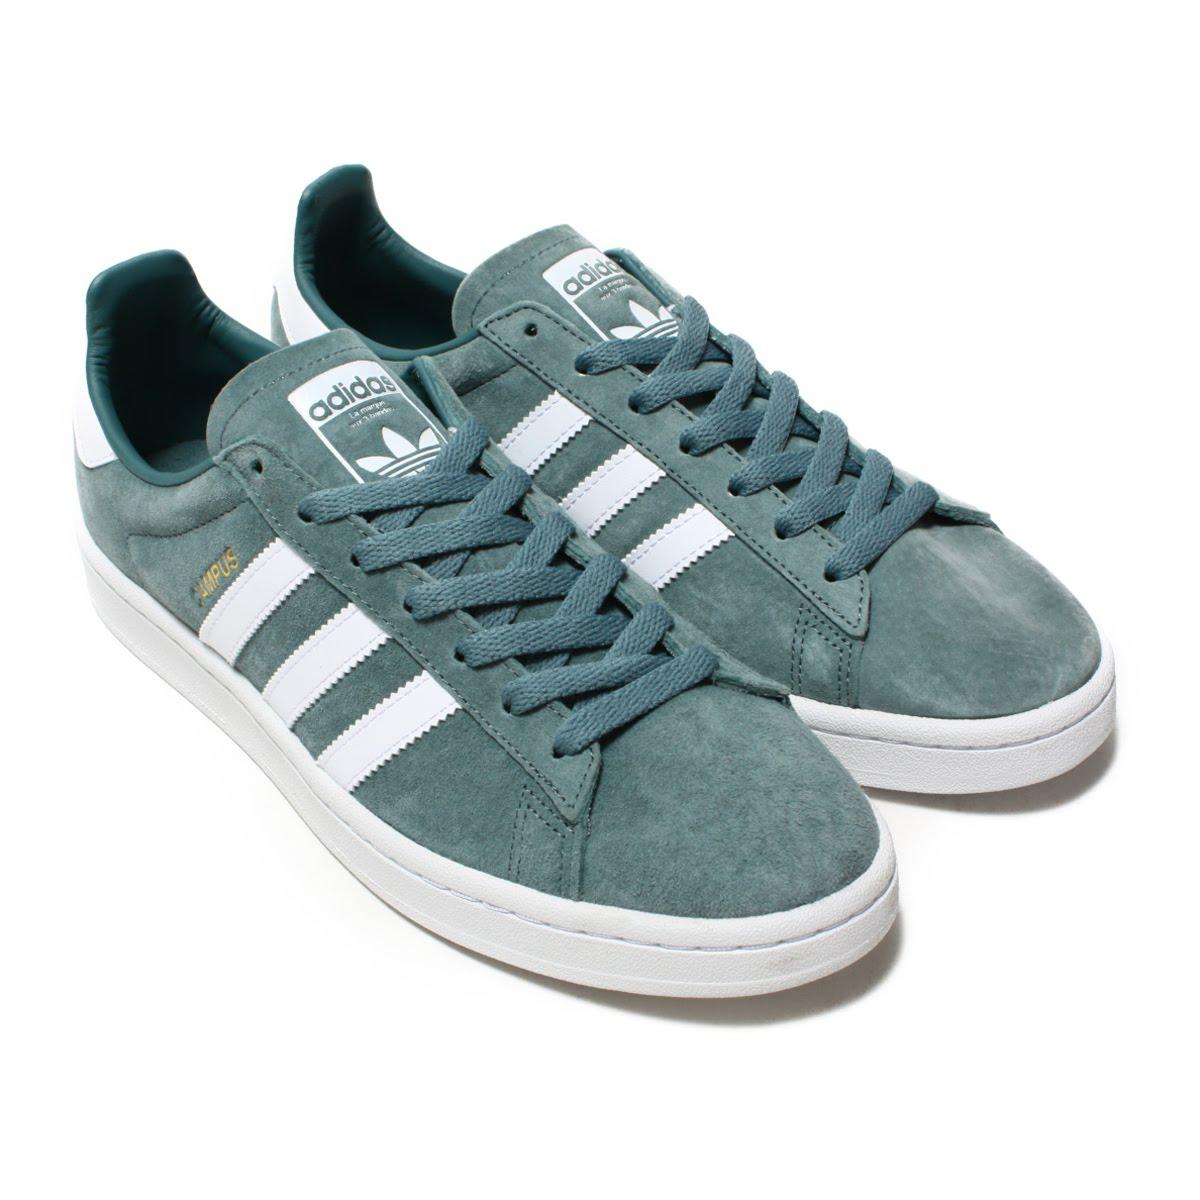 adidas CAMPUS (Adidas campus) Raw GreenRunning WhiteCrystal White 18FW I